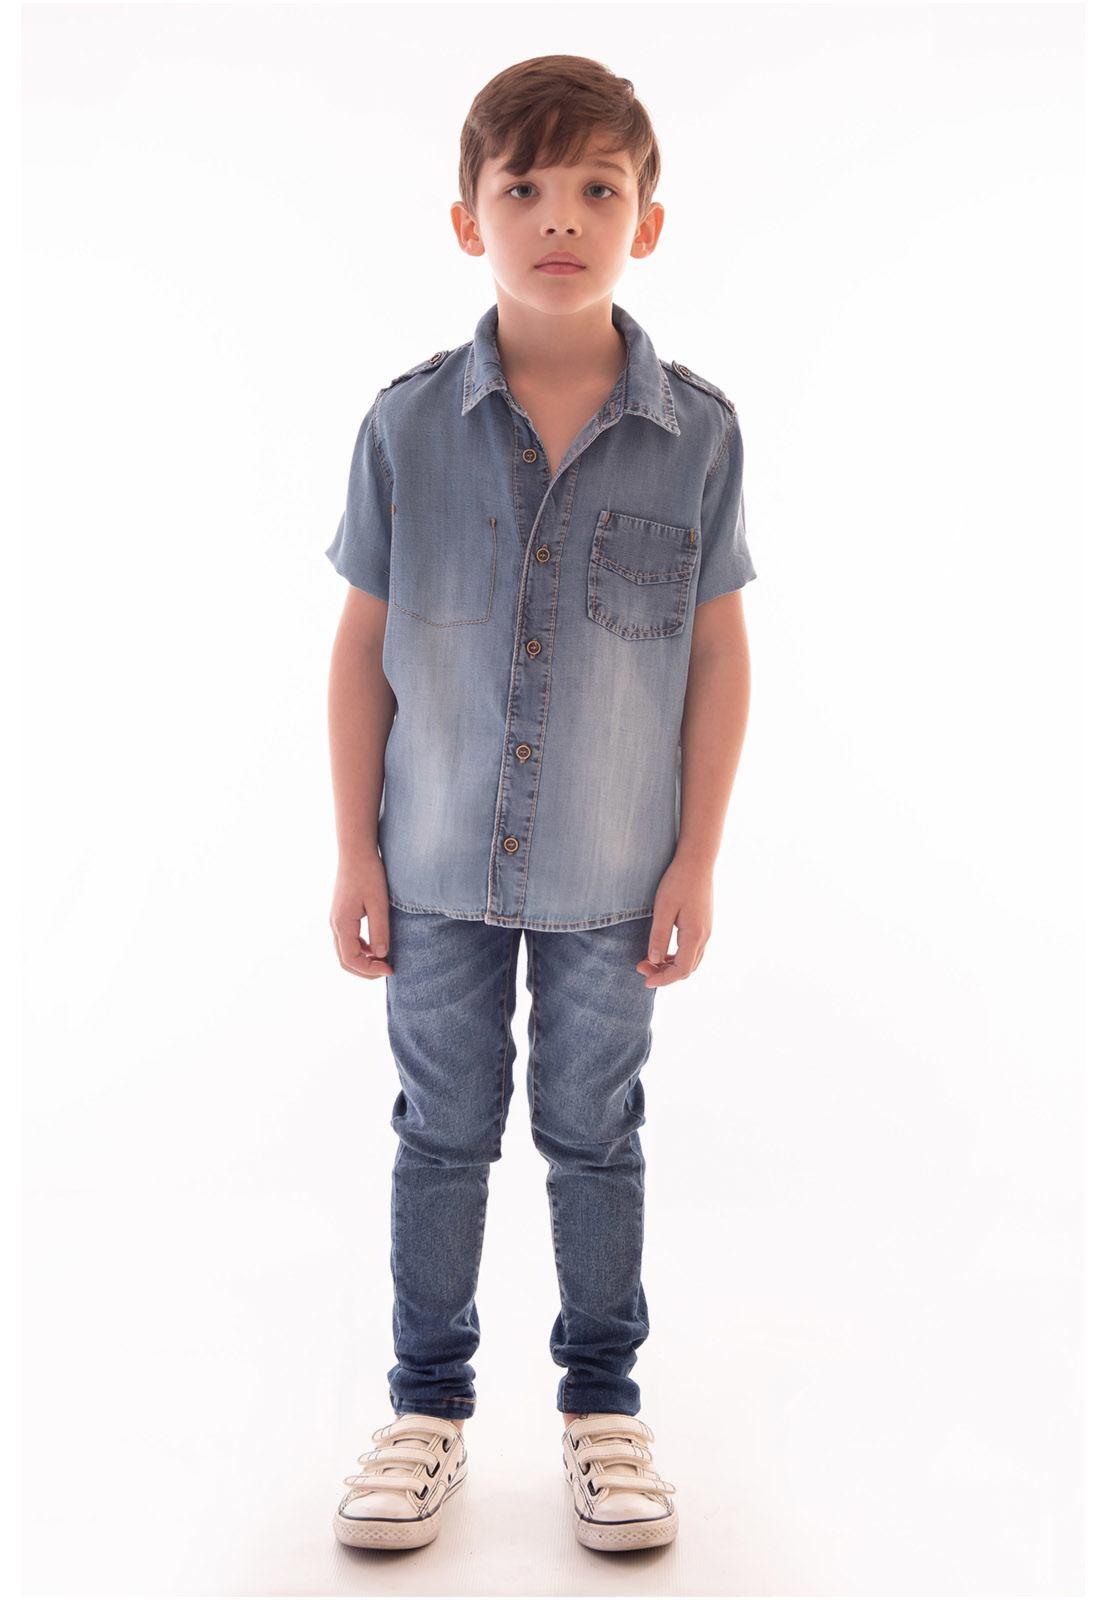 Camisa Jeans Lyocel Manga Curta Ref. 516